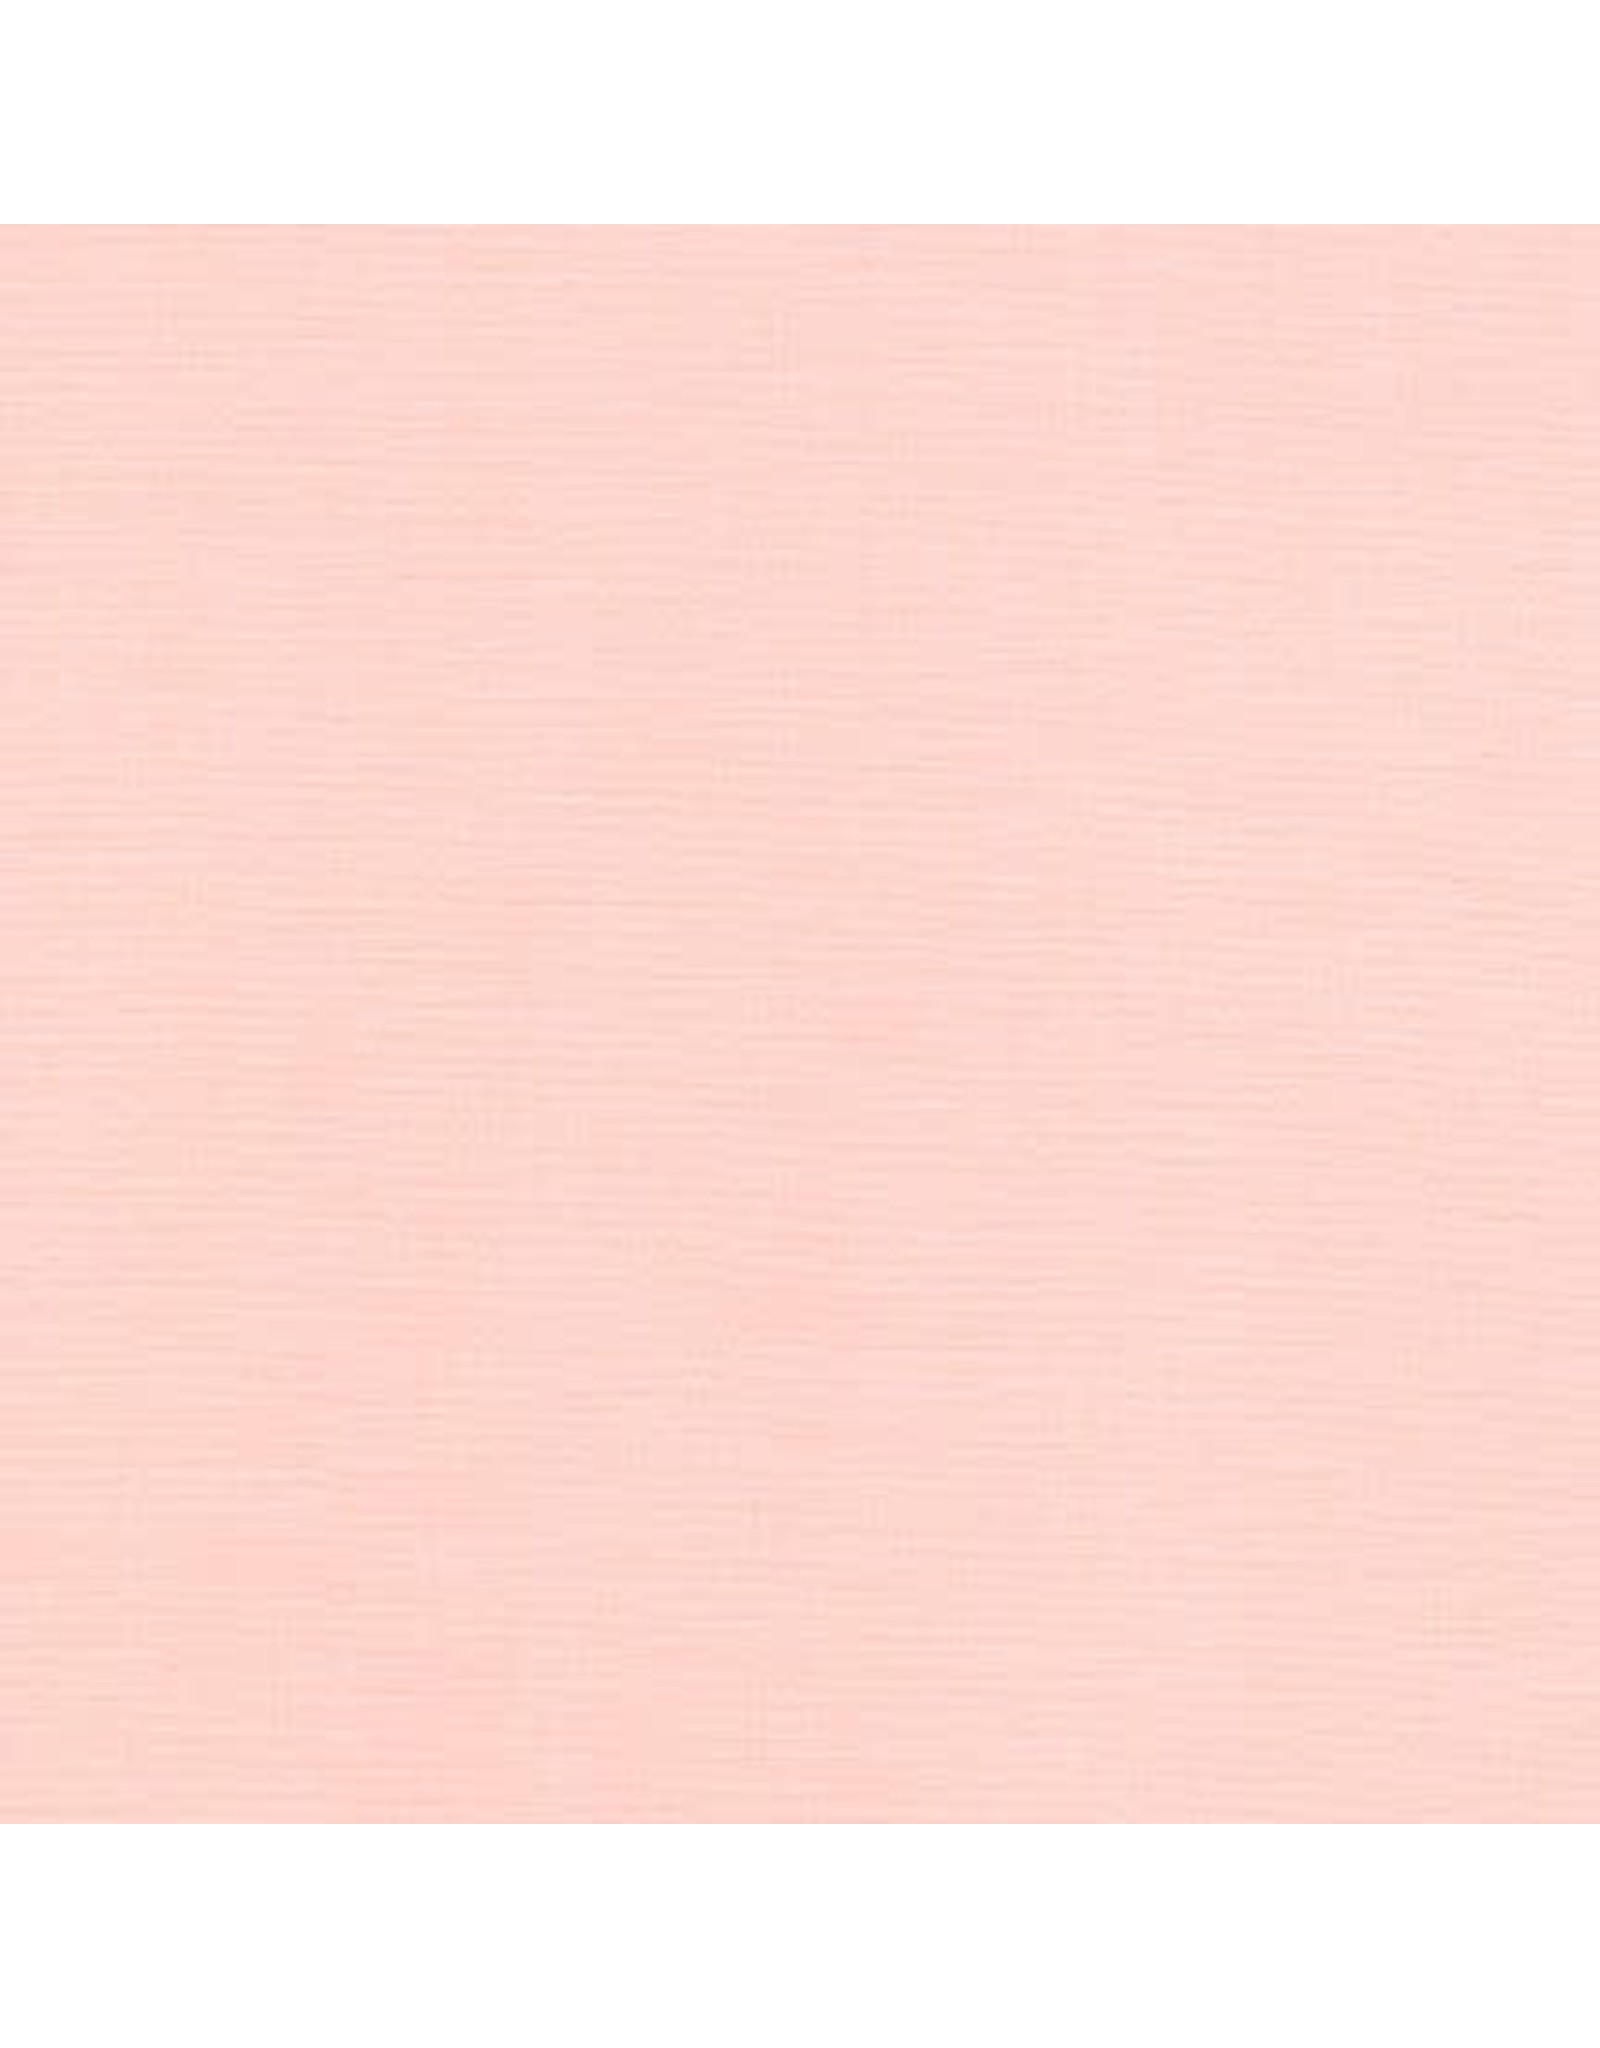 Robert Kaufman Kona Cotton in Ballet Slipper, Fabric Half-Yards